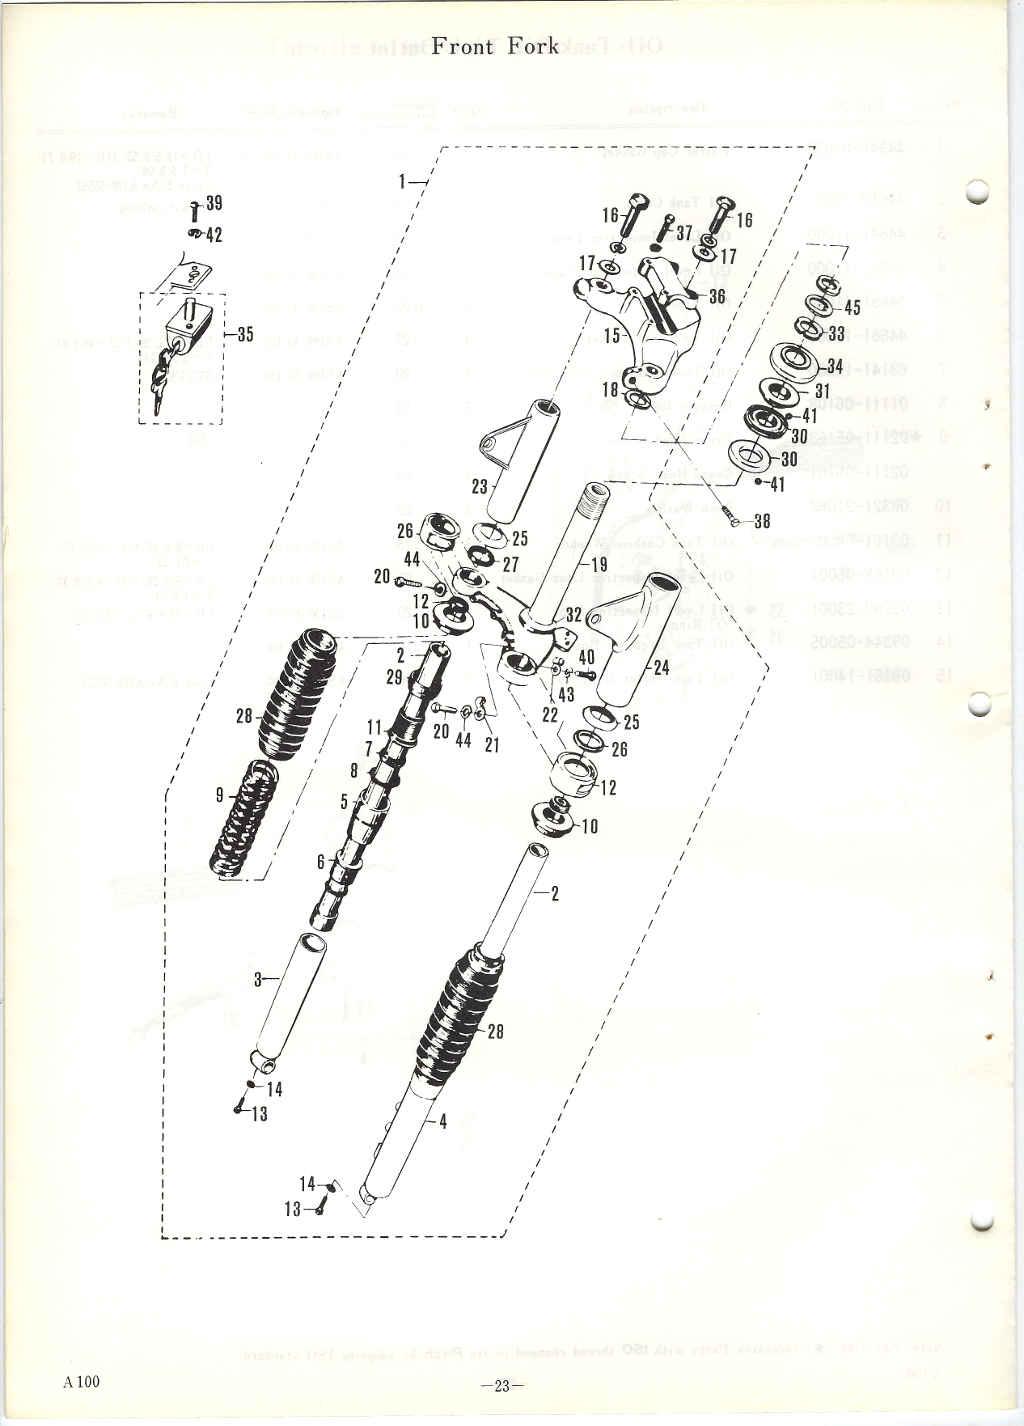 Suzuki A100 Parts Manual